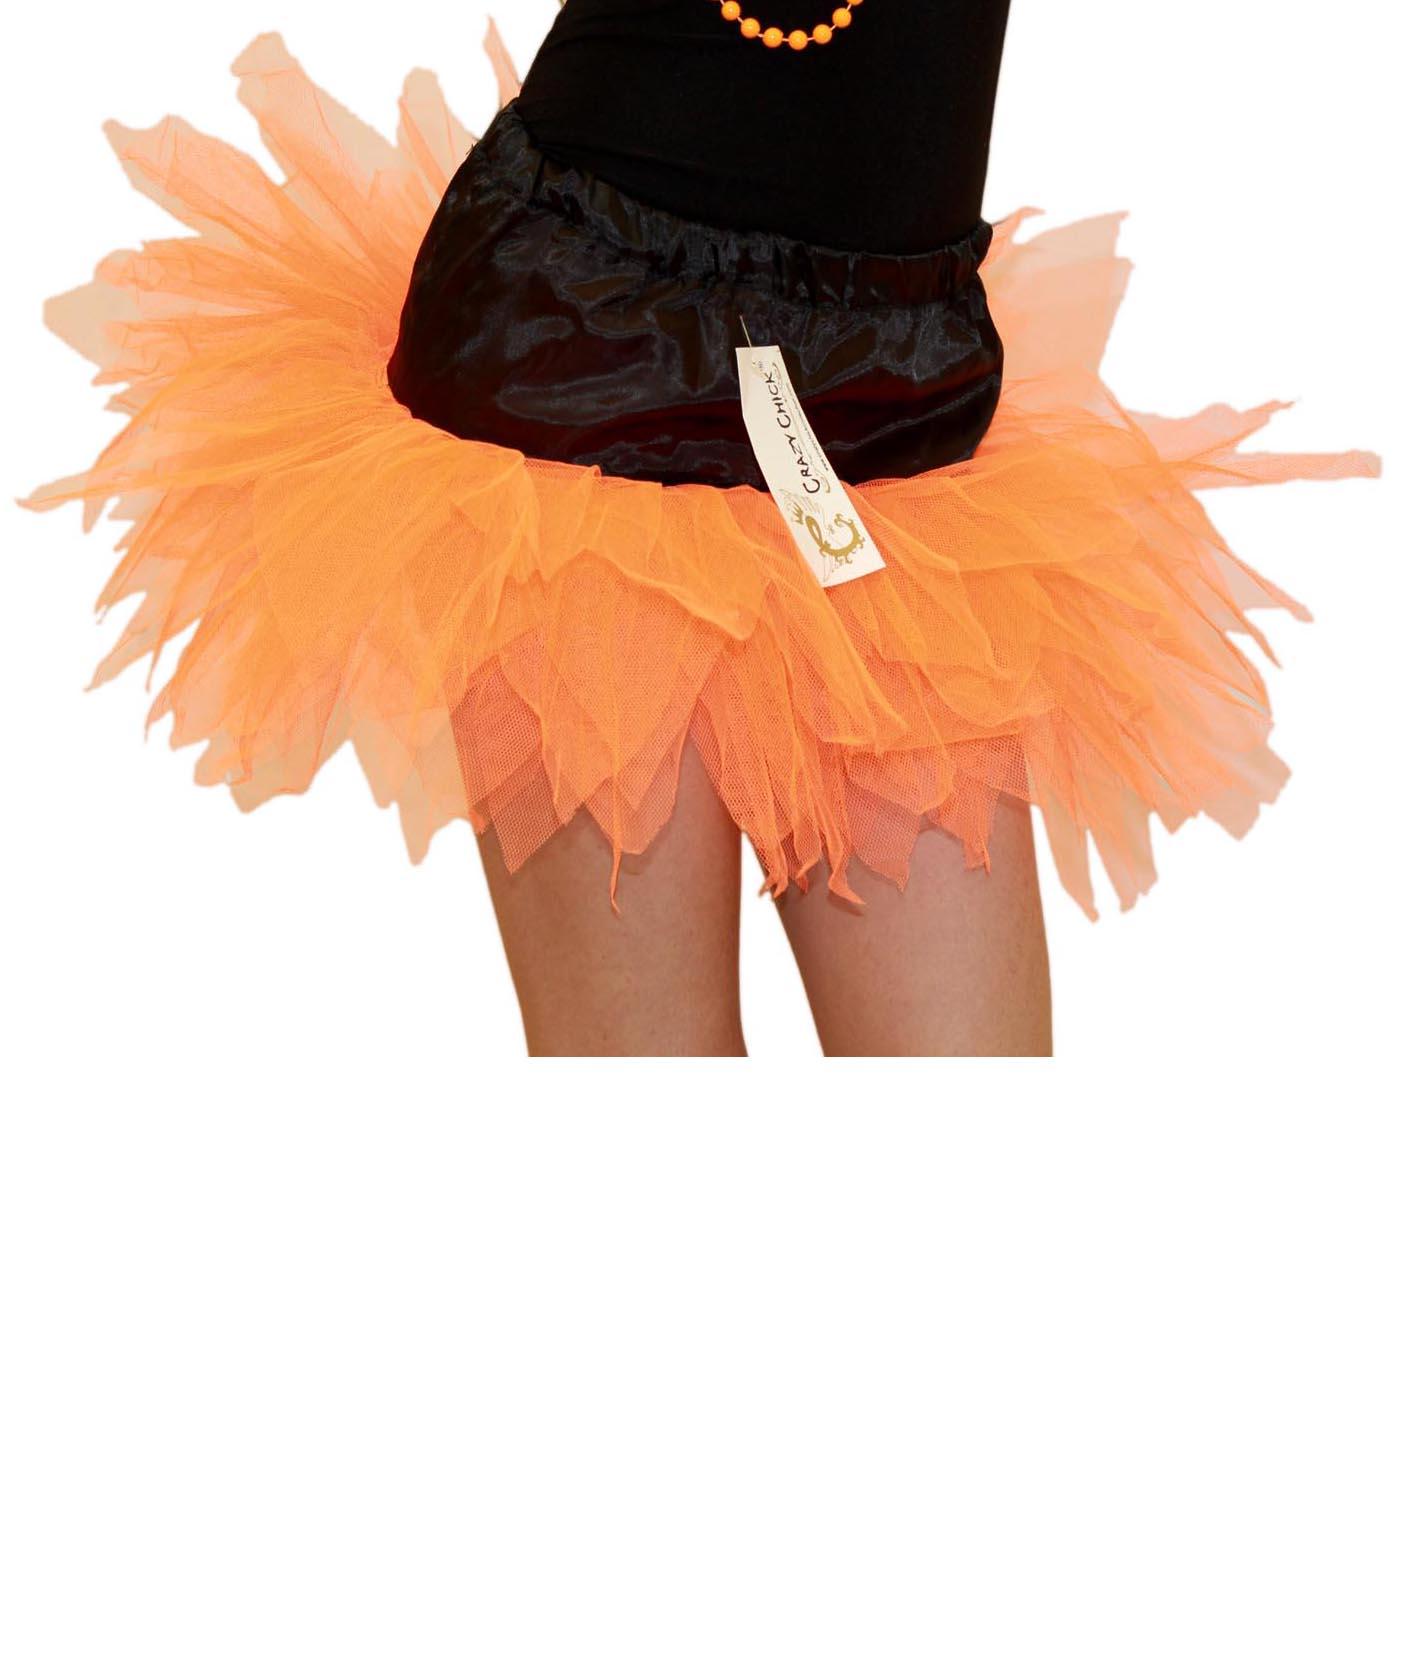 Crazy Chick Girls 6 Layers Petal Orange Black Witch TuTu Skirt (12 Inches Long)